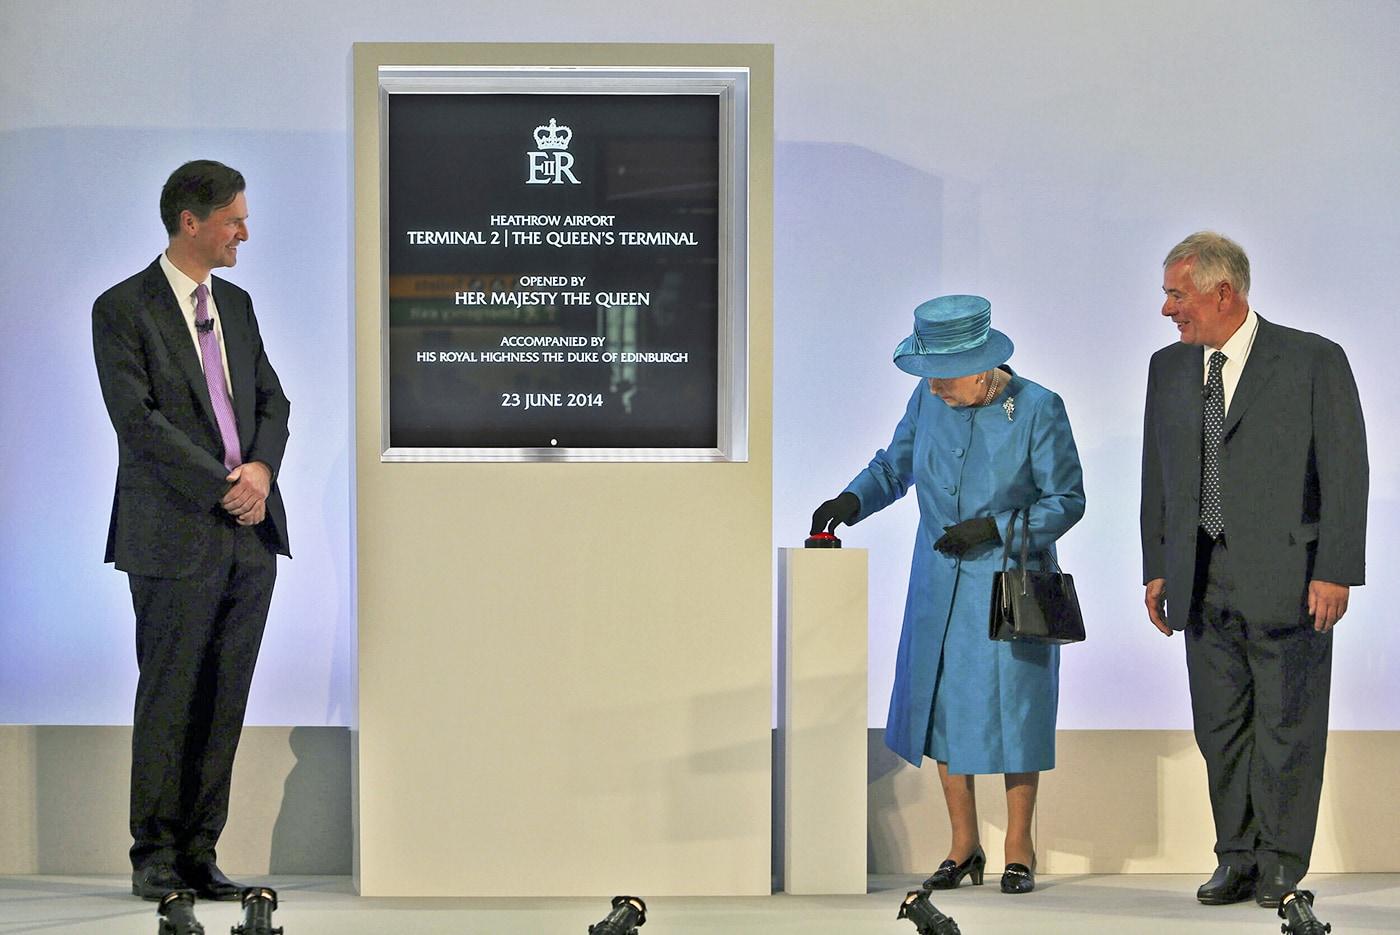 Heathrow Terminal 2 opening